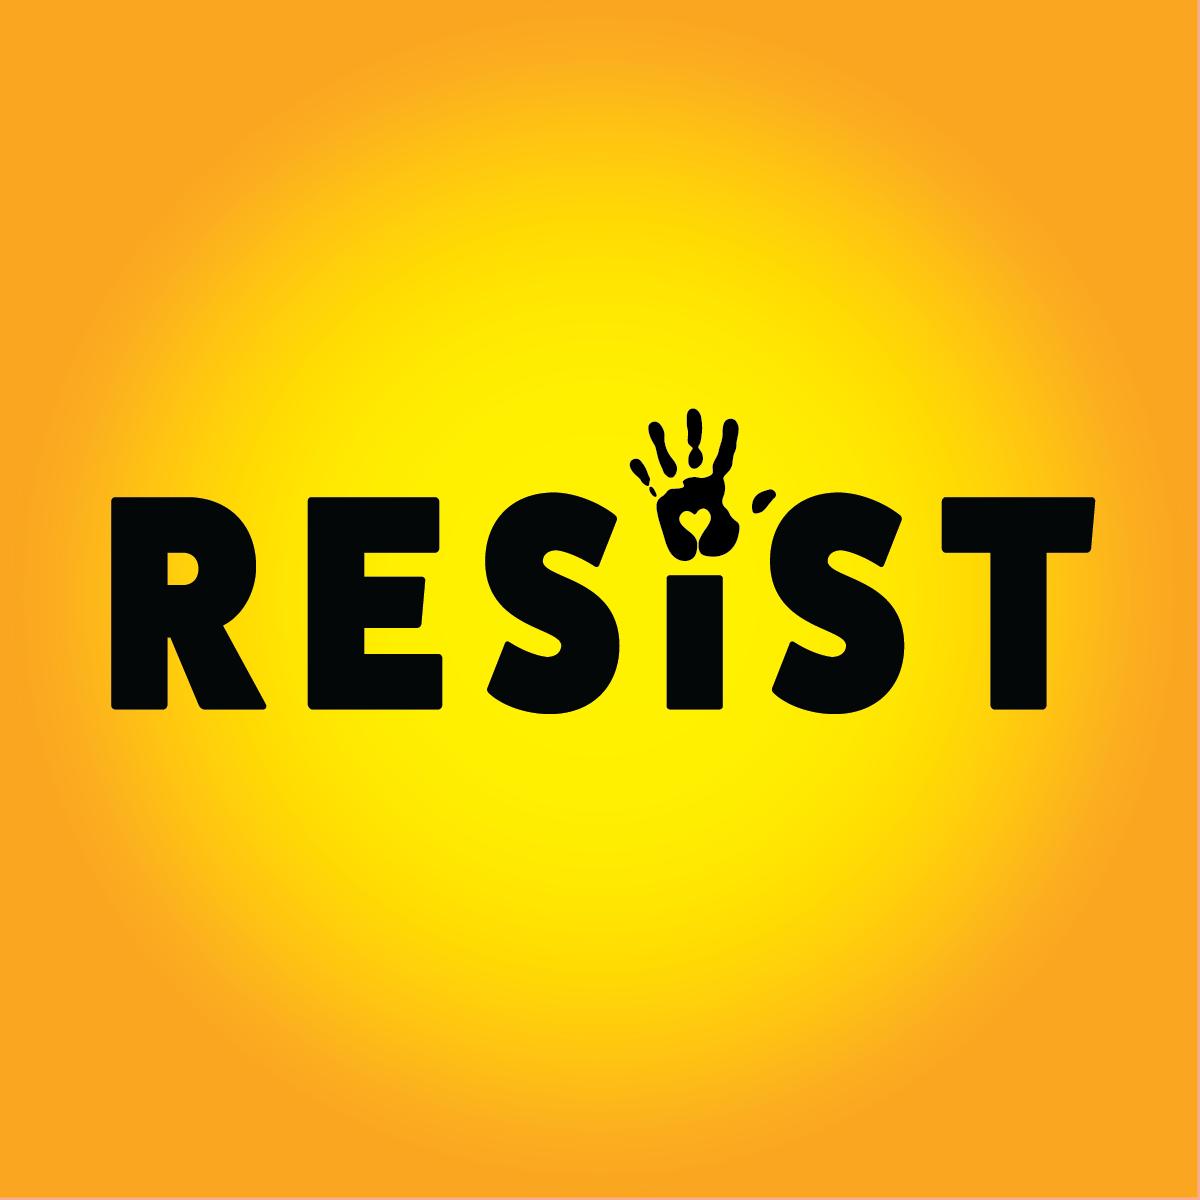 resist  printable and social media materials